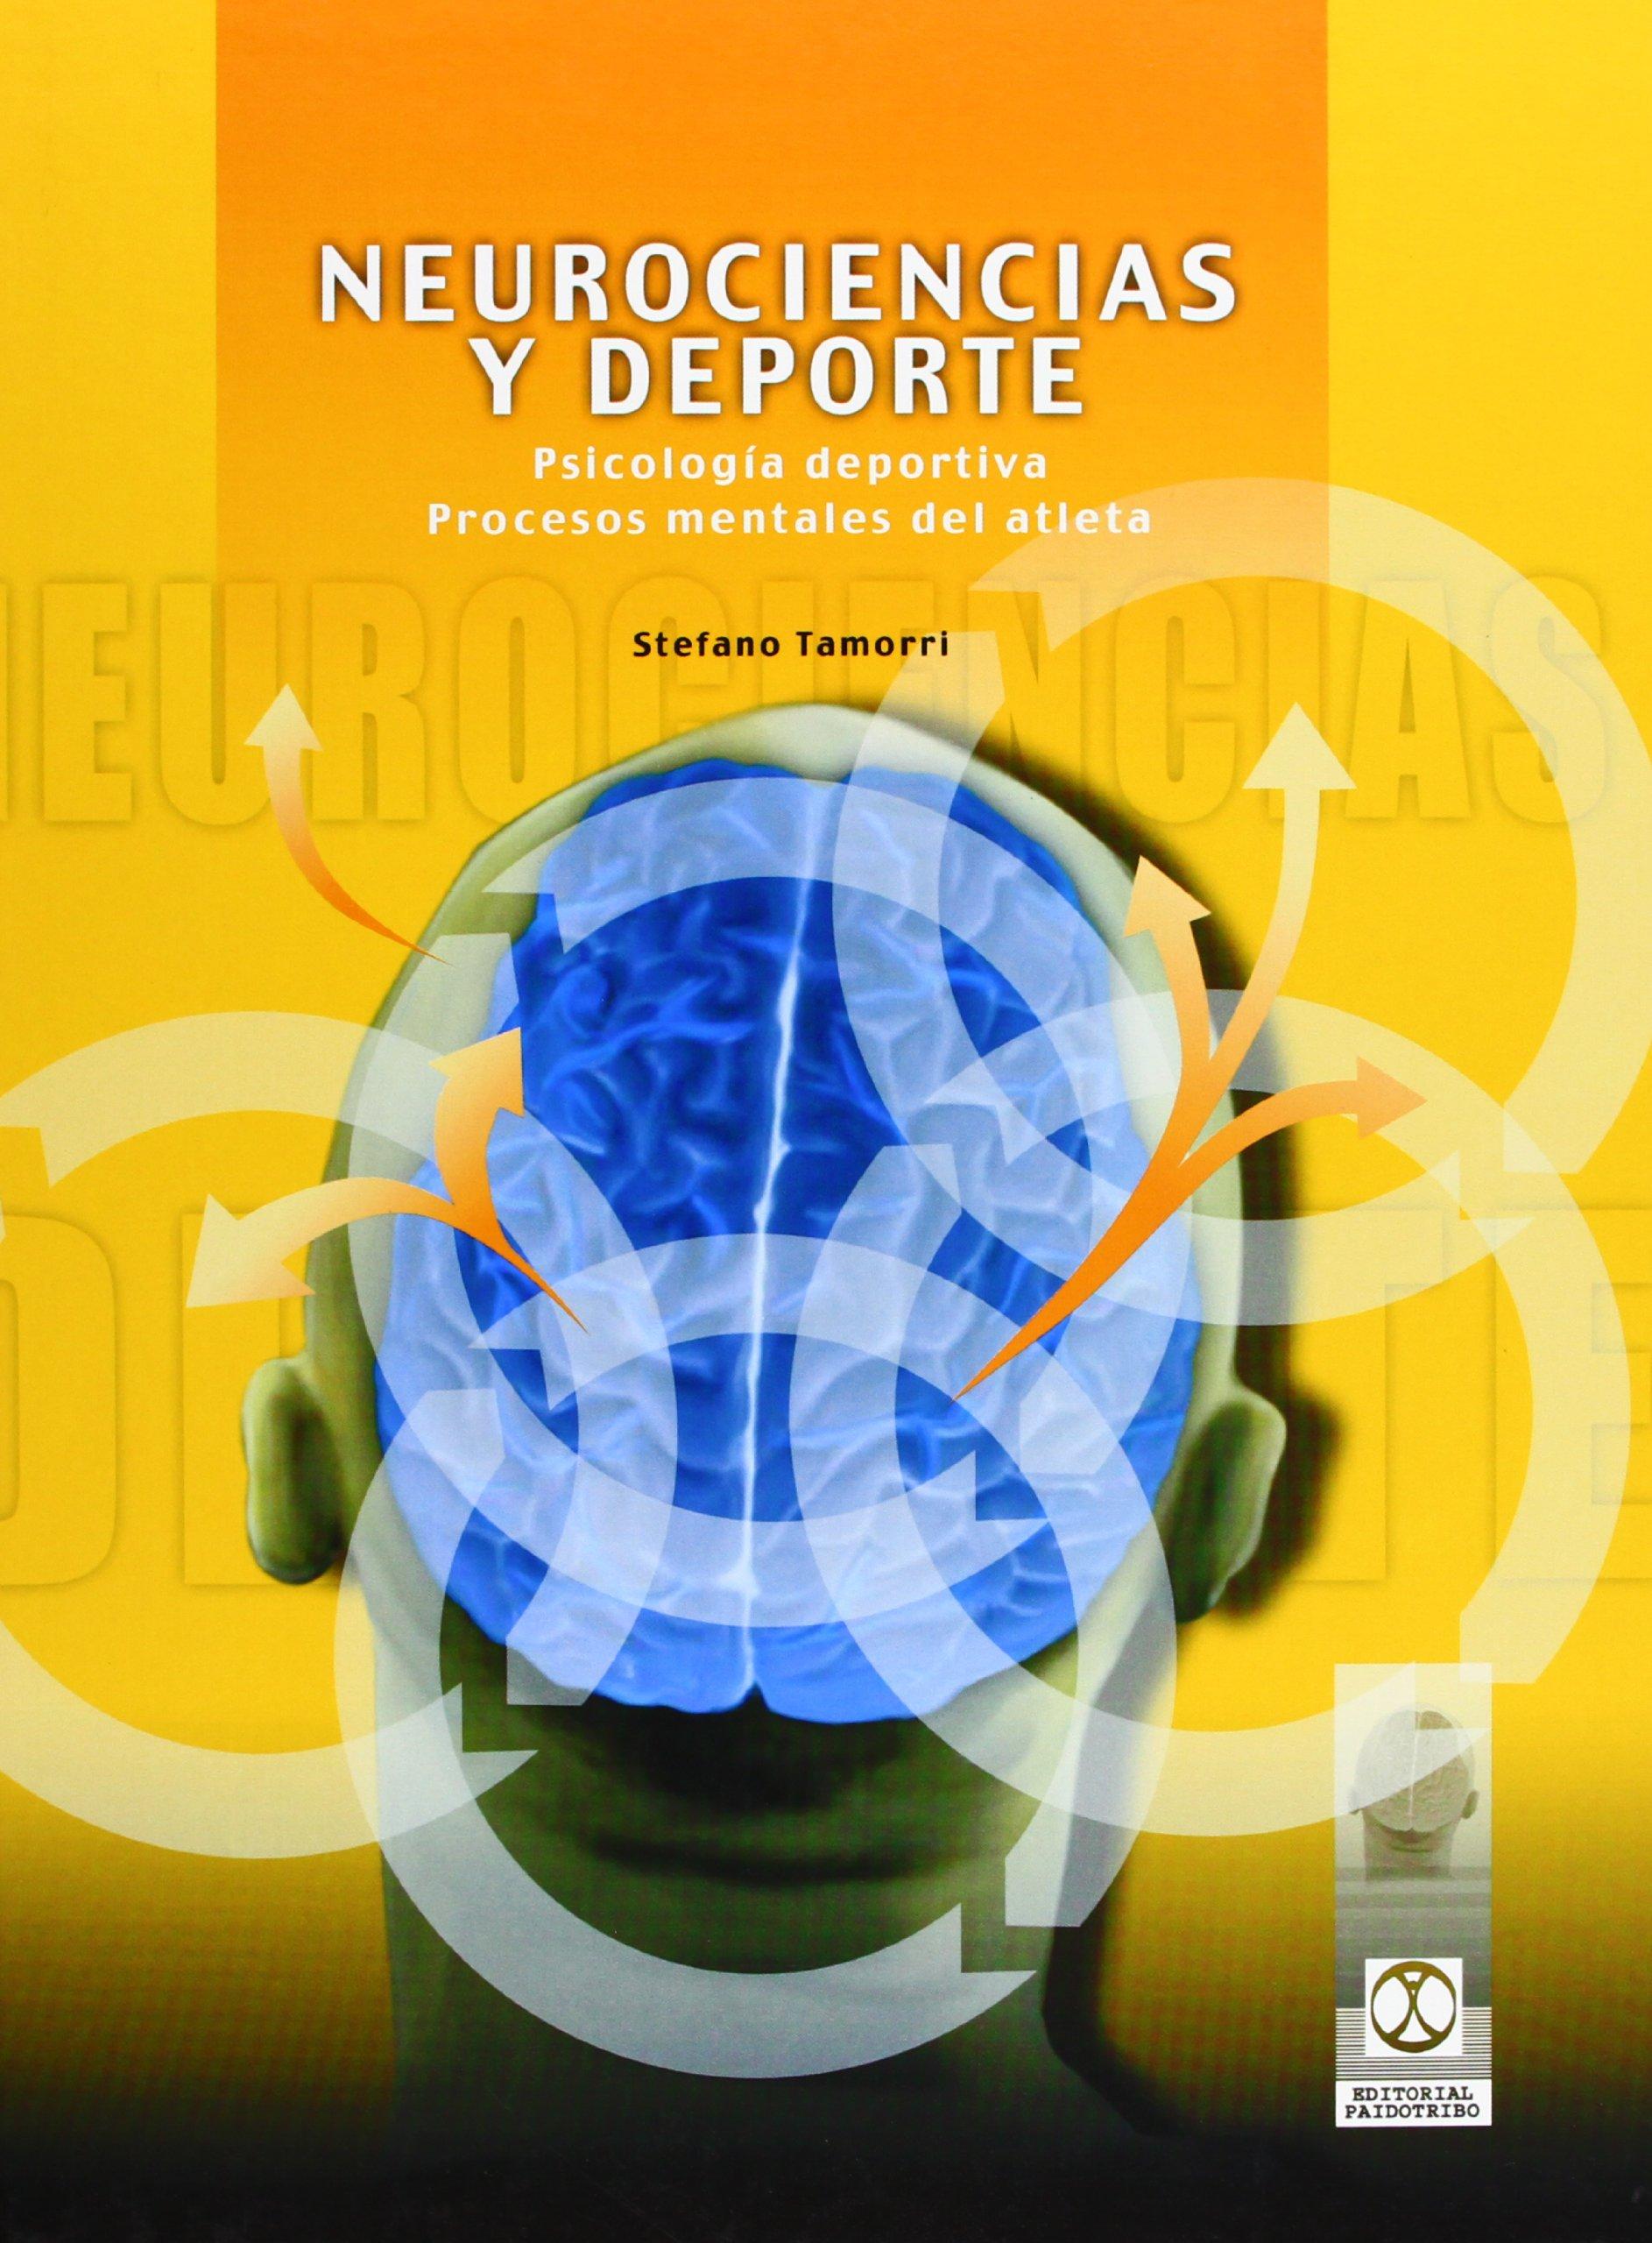 Neurociencias y deporte (Deportes) Tapa blanda – 5 ene 2018 Stefano Tamorri Paidotribo 8480196912 General